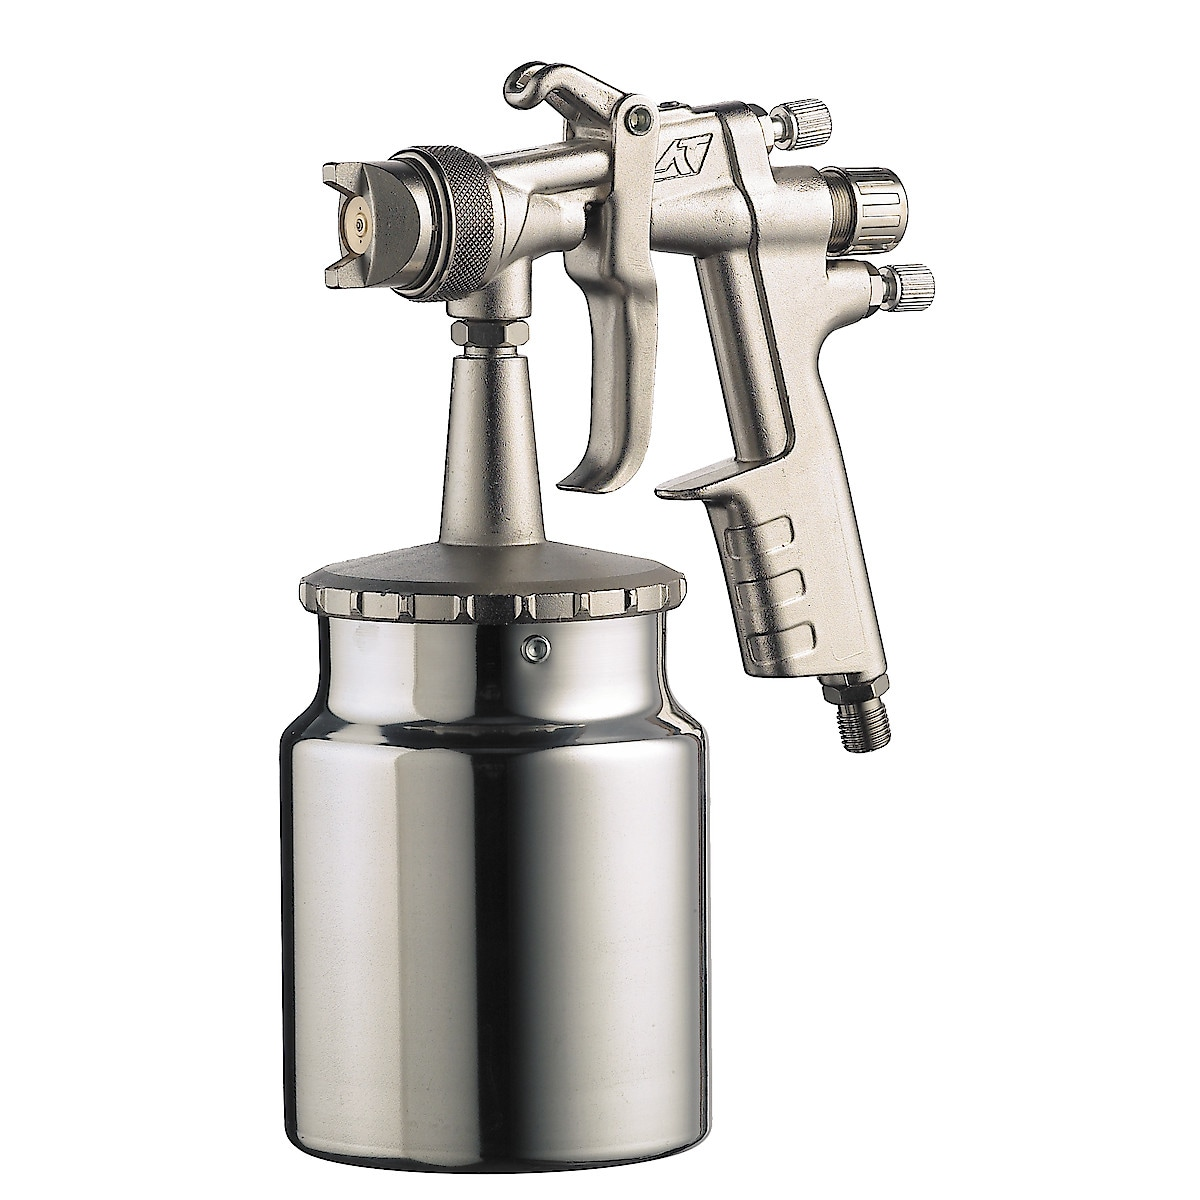 Ani AT/I-15 Spray Gun